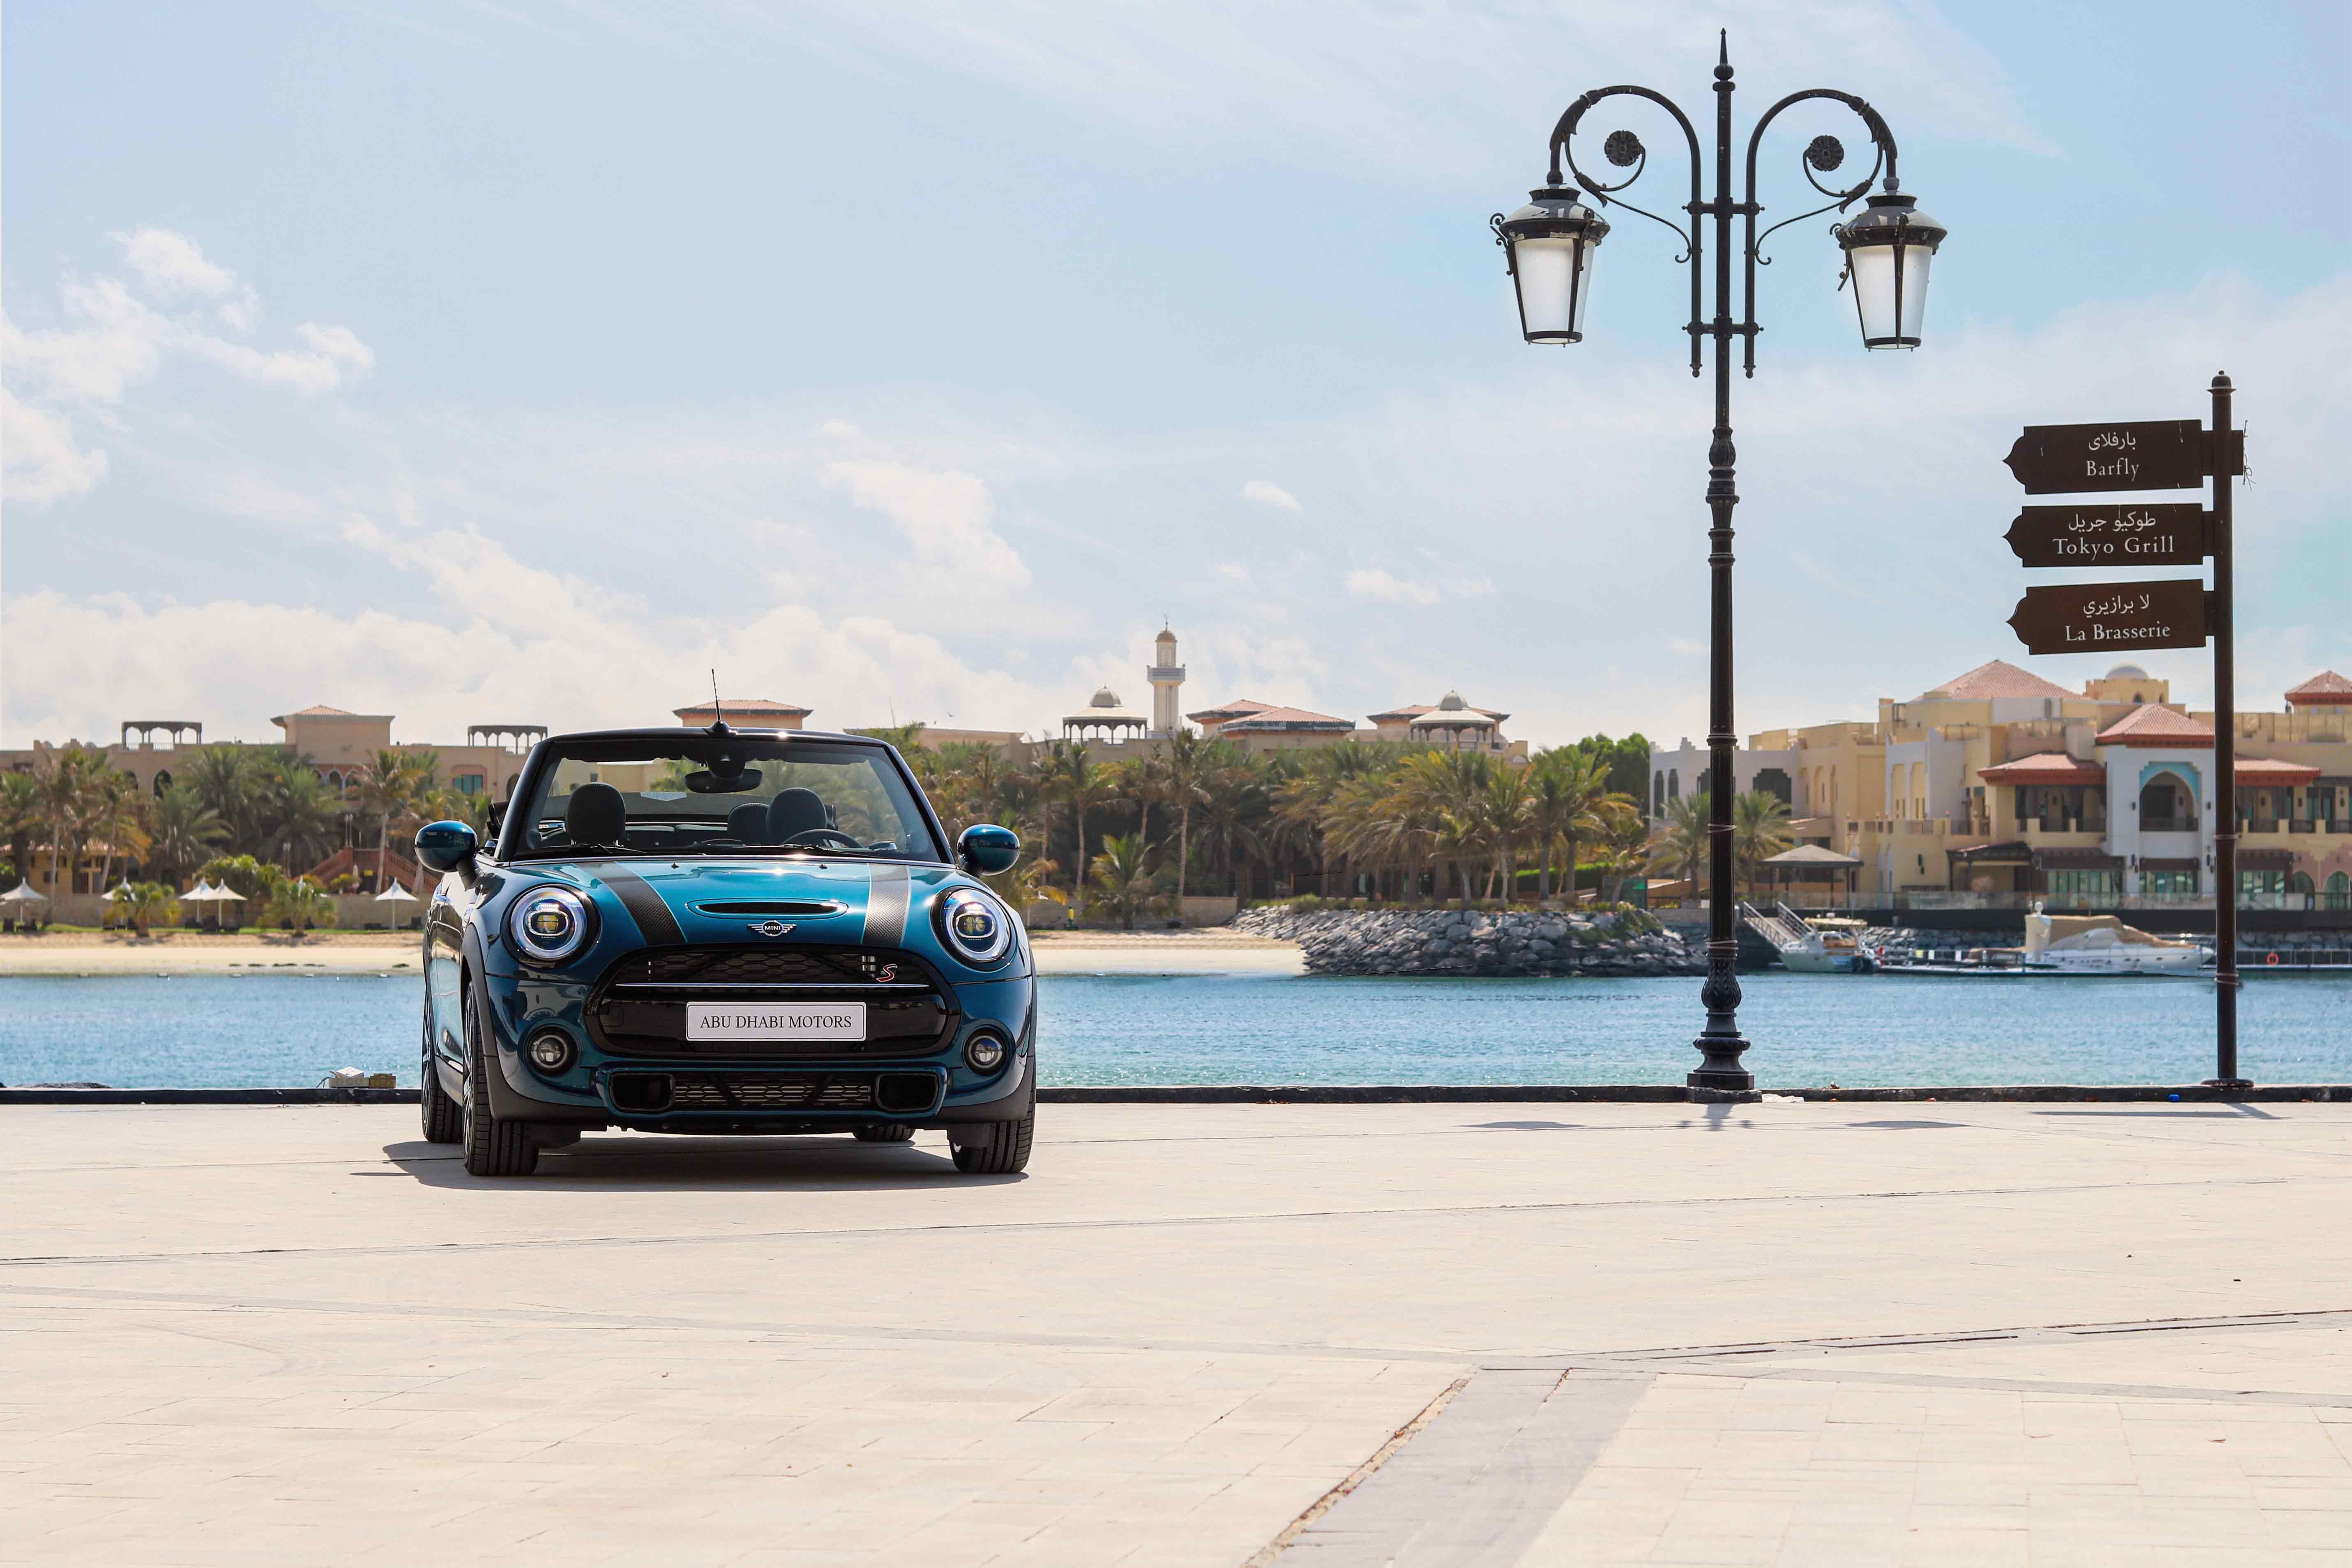 Abu Dhabi Motors introduces the 2021 MINI Sidewalk Convertible